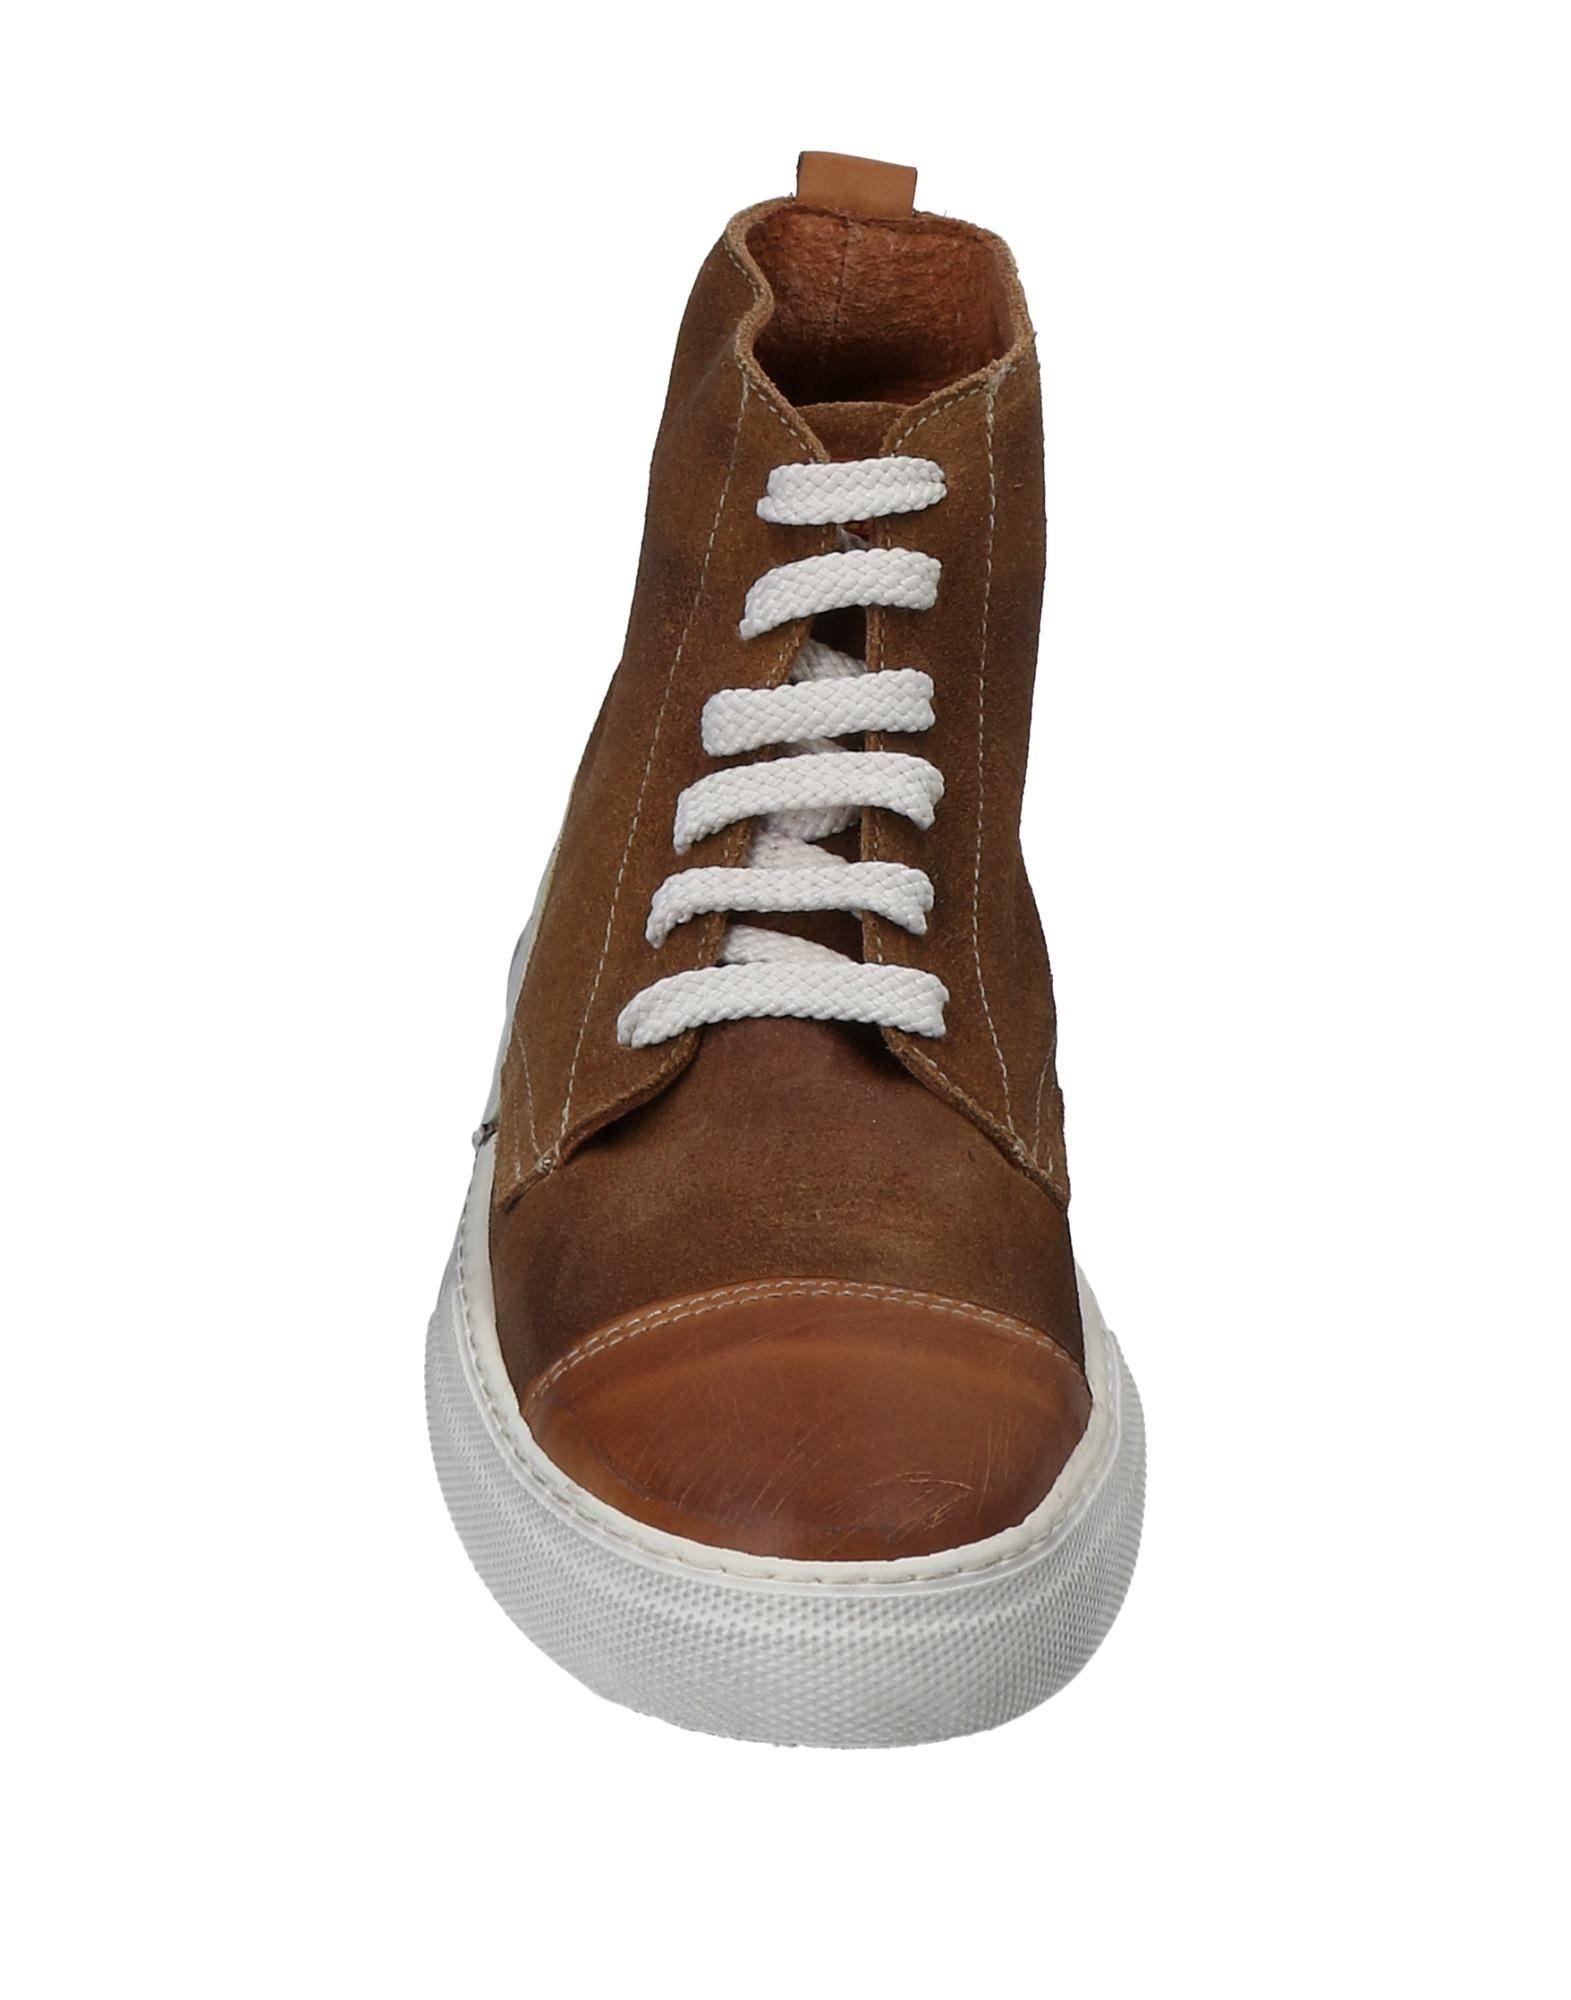 Rabatt echte Schuhe Herren 3:10 Sneakers Herren Schuhe  11557407OC 19aeed